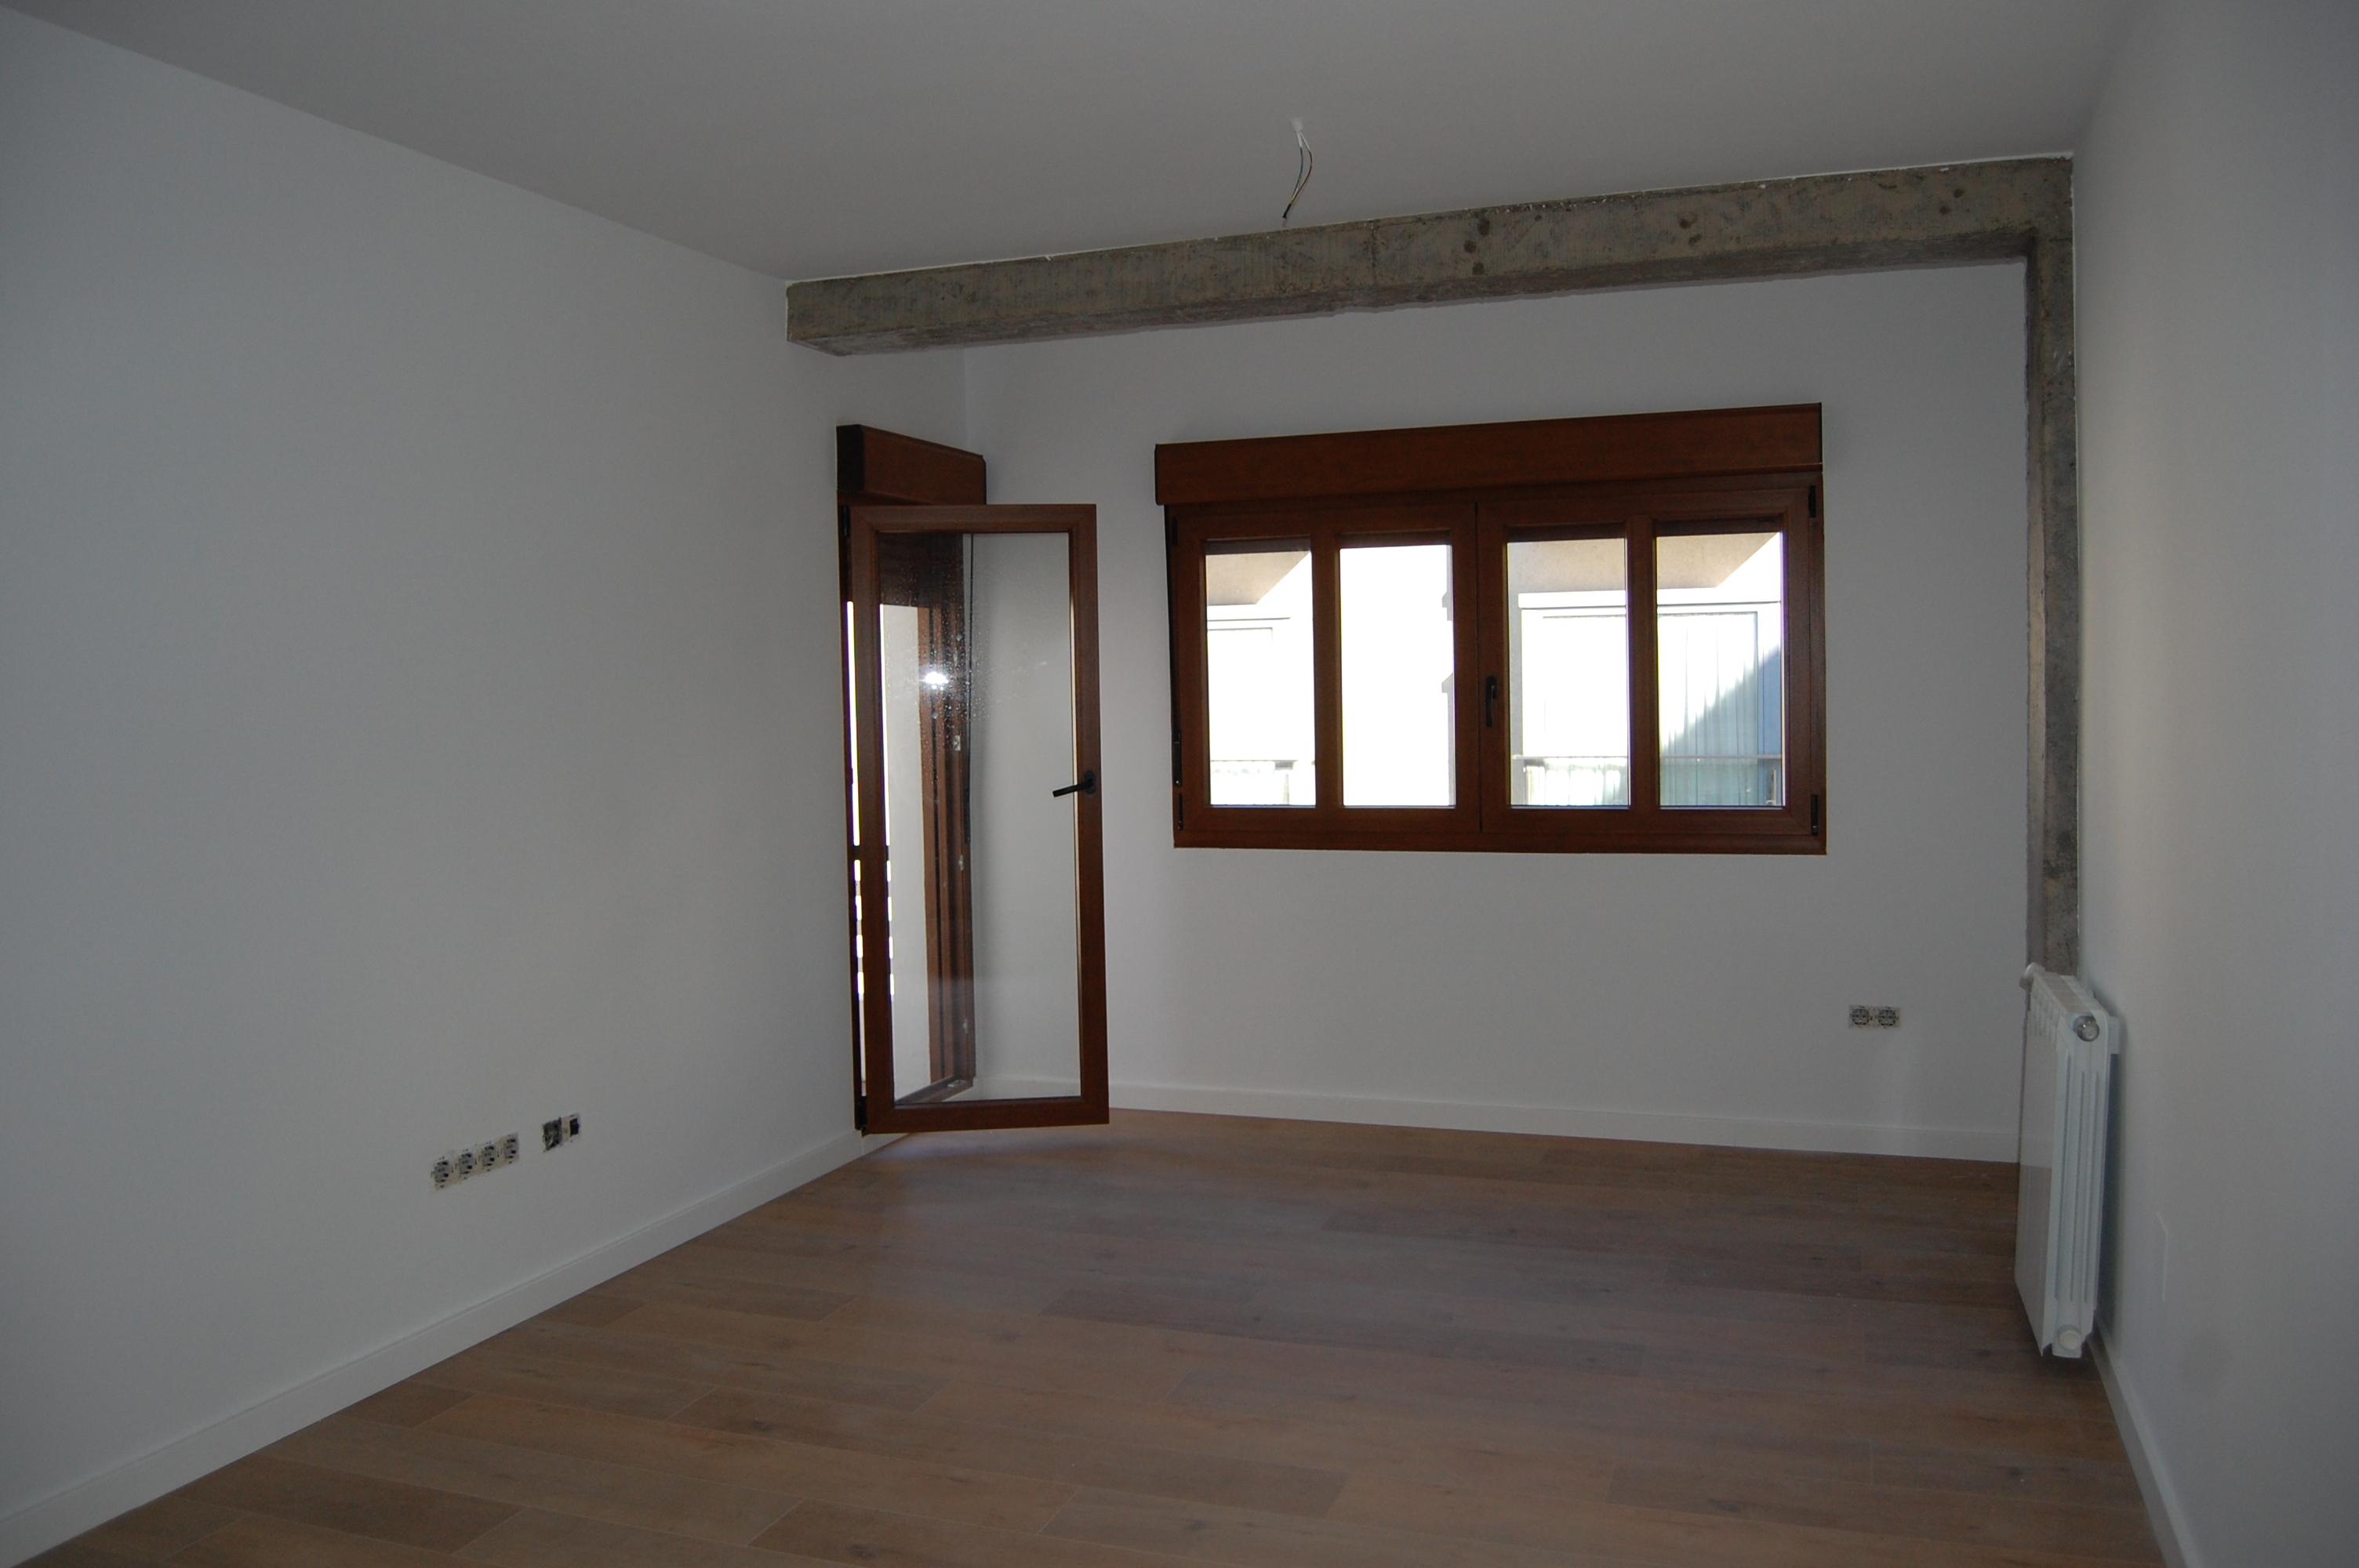 Rehabilitación vivienda. Casto histórico Pontevedra